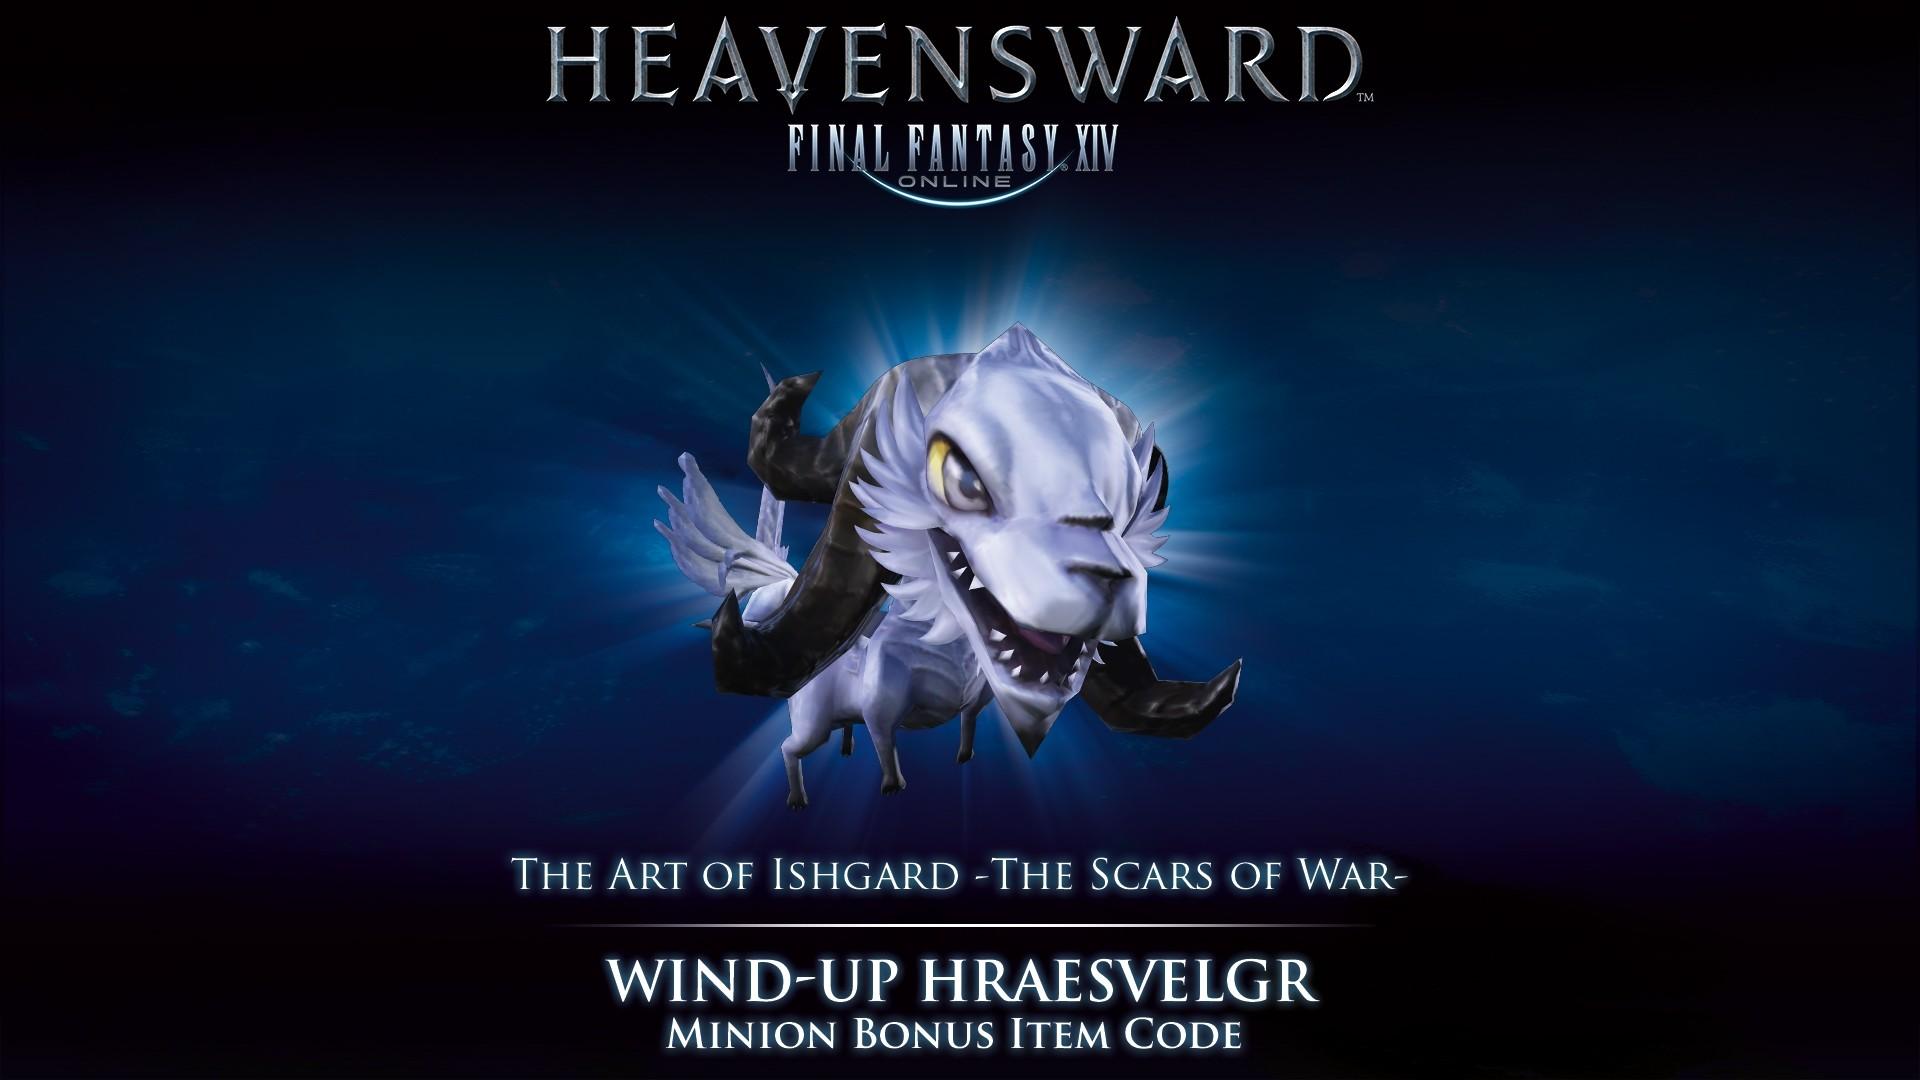 FINAL FANTASY XIV: Heavensward – The Art of Ishgard – The Scars of War –  [Artbook] | Square Enix Online Store